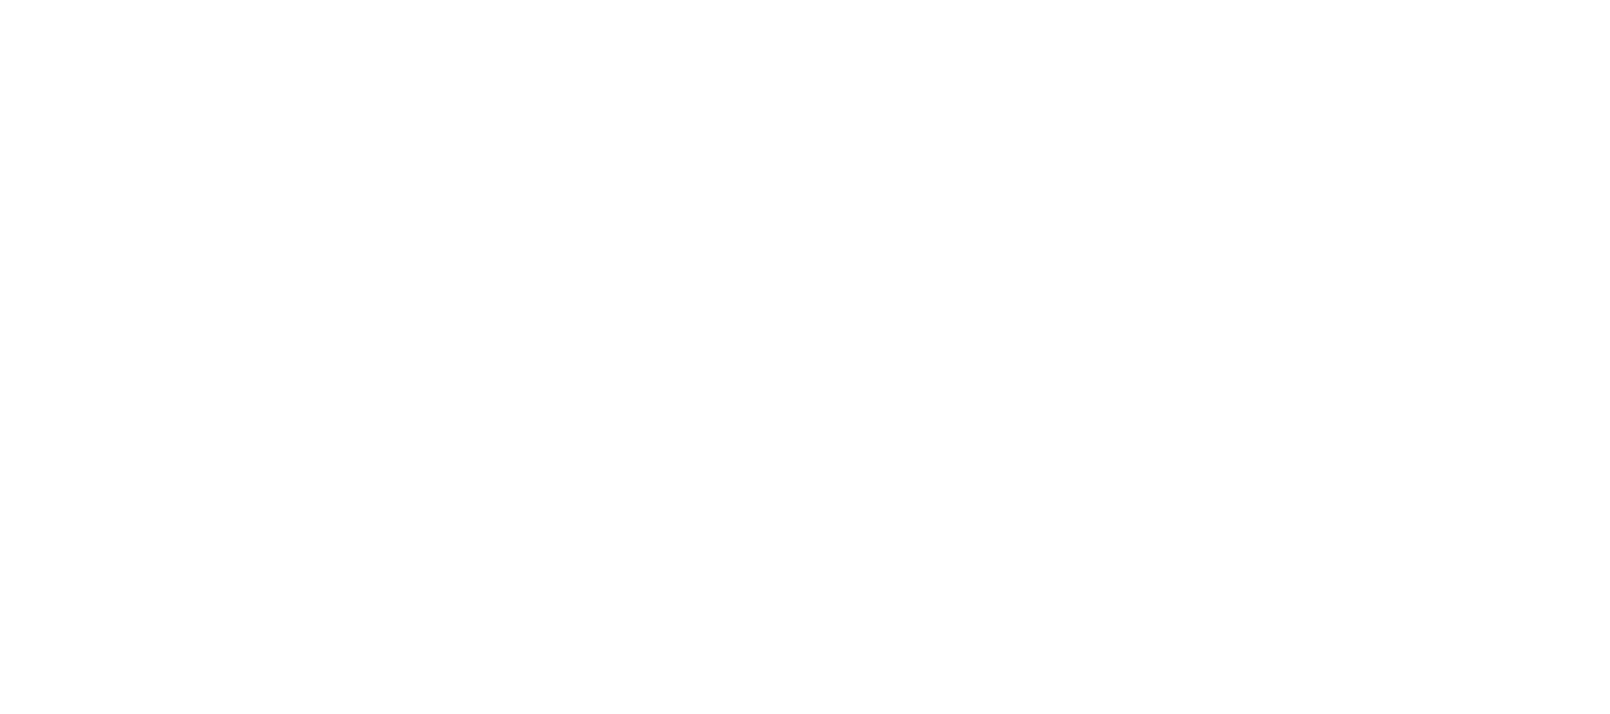 Alexis Veille